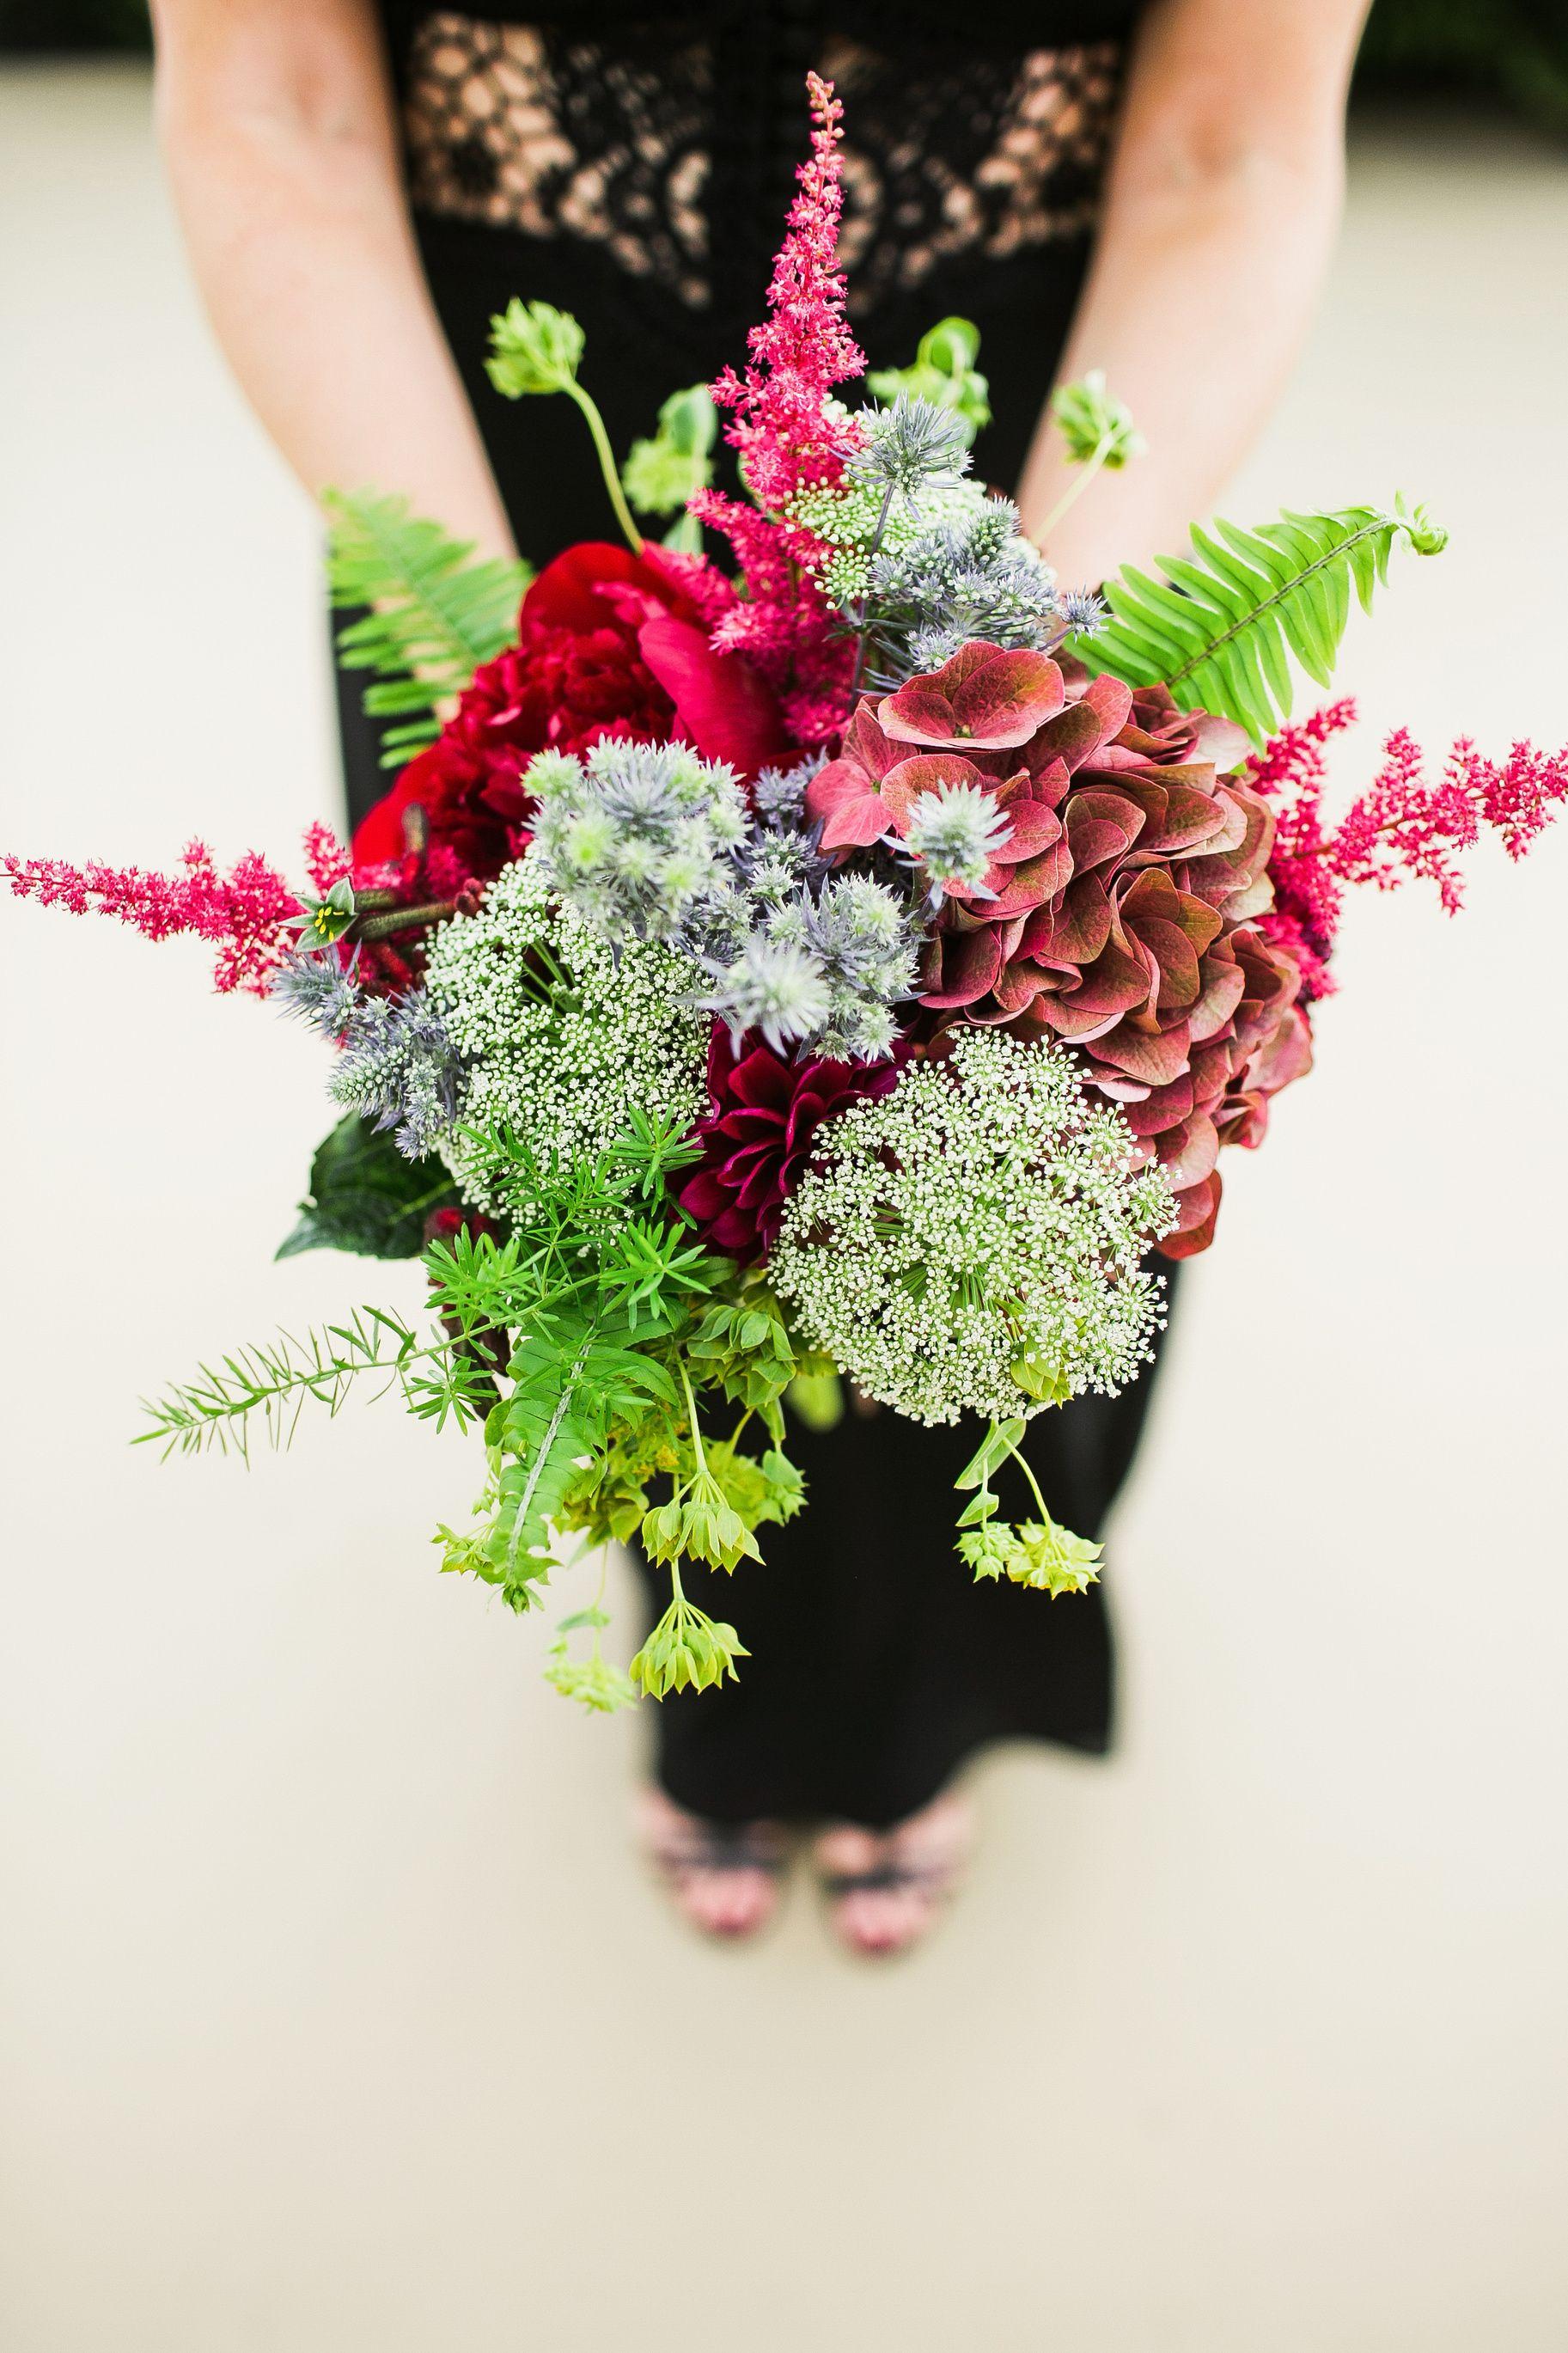 Bouquet Flowers By Heidi Flowersbyheidi Pc Ruth Ann Photography Hawaii Flowers Flowers Bouquet Wedding Flowers